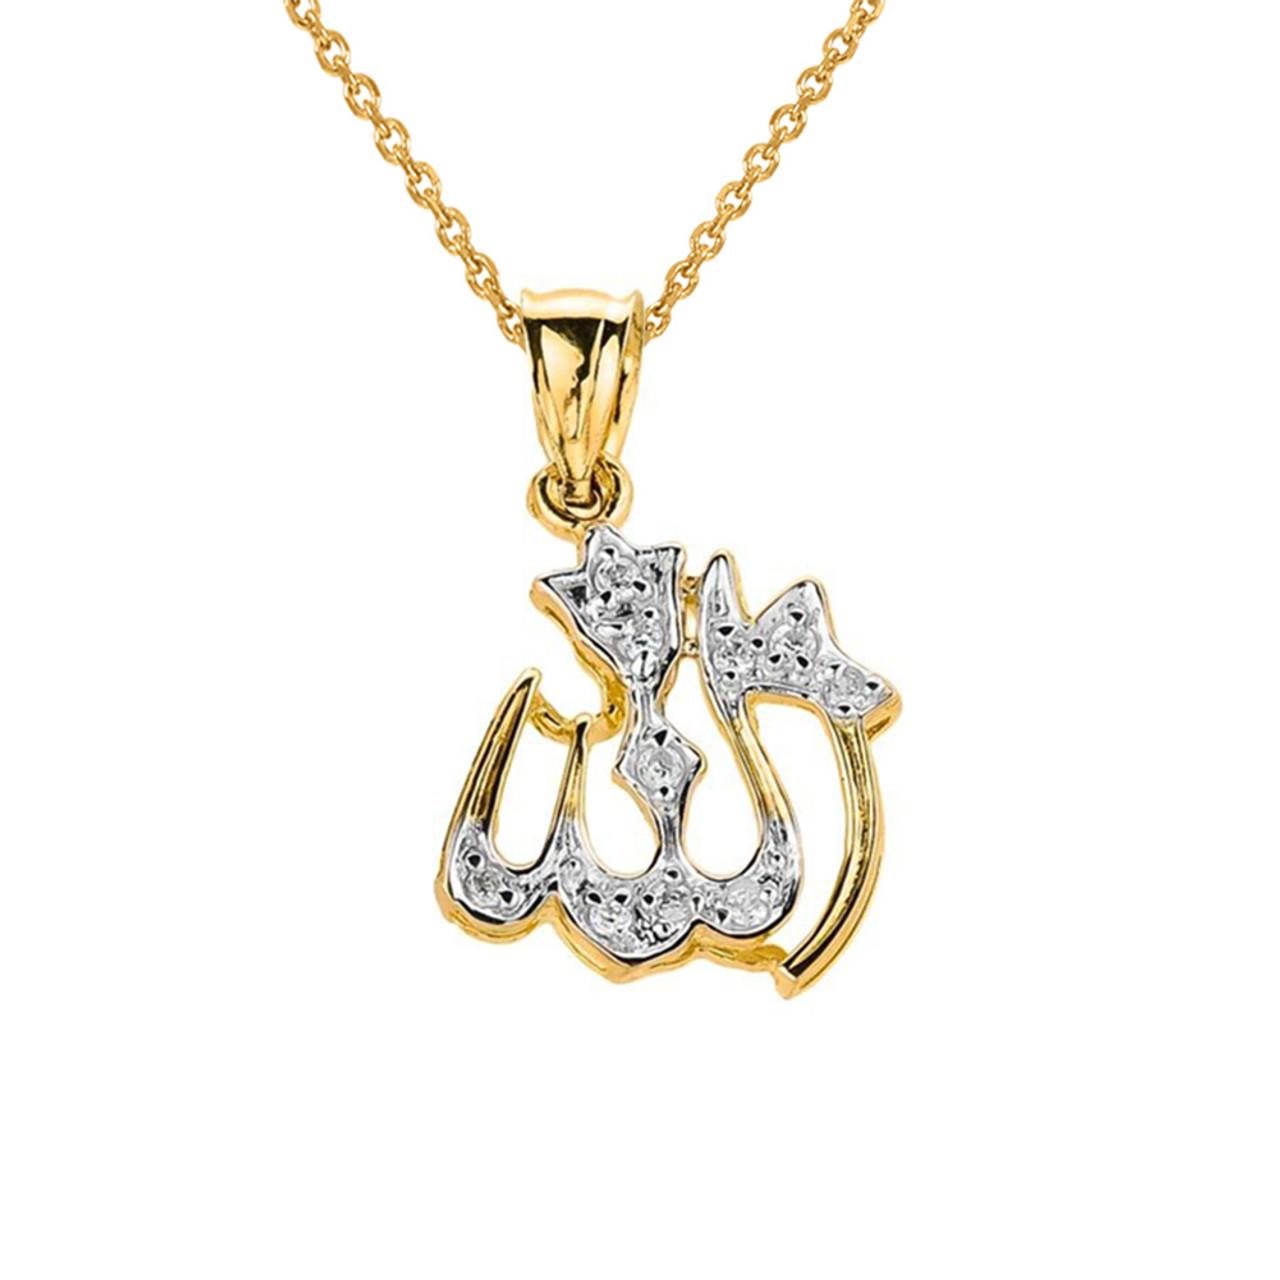 Yellow gold diamonds studded allah pendant necklace aloadofball Gallery